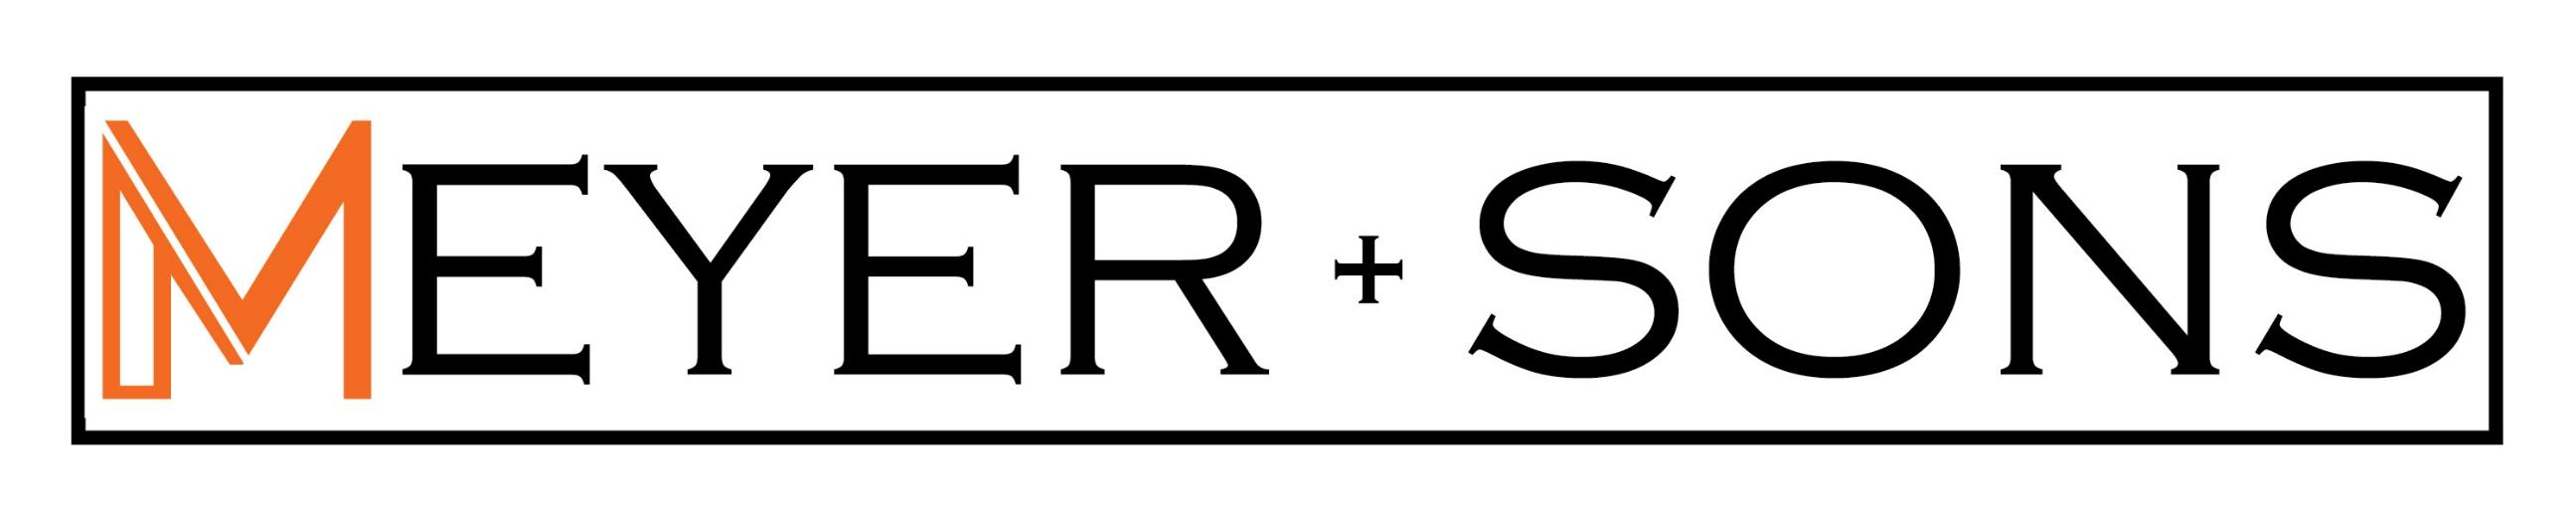 https://growthzonesitesprod.azureedge.net/wp-content/uploads/sites/1450/2020/08/Meyer-and-Sons-Logo.jpeg